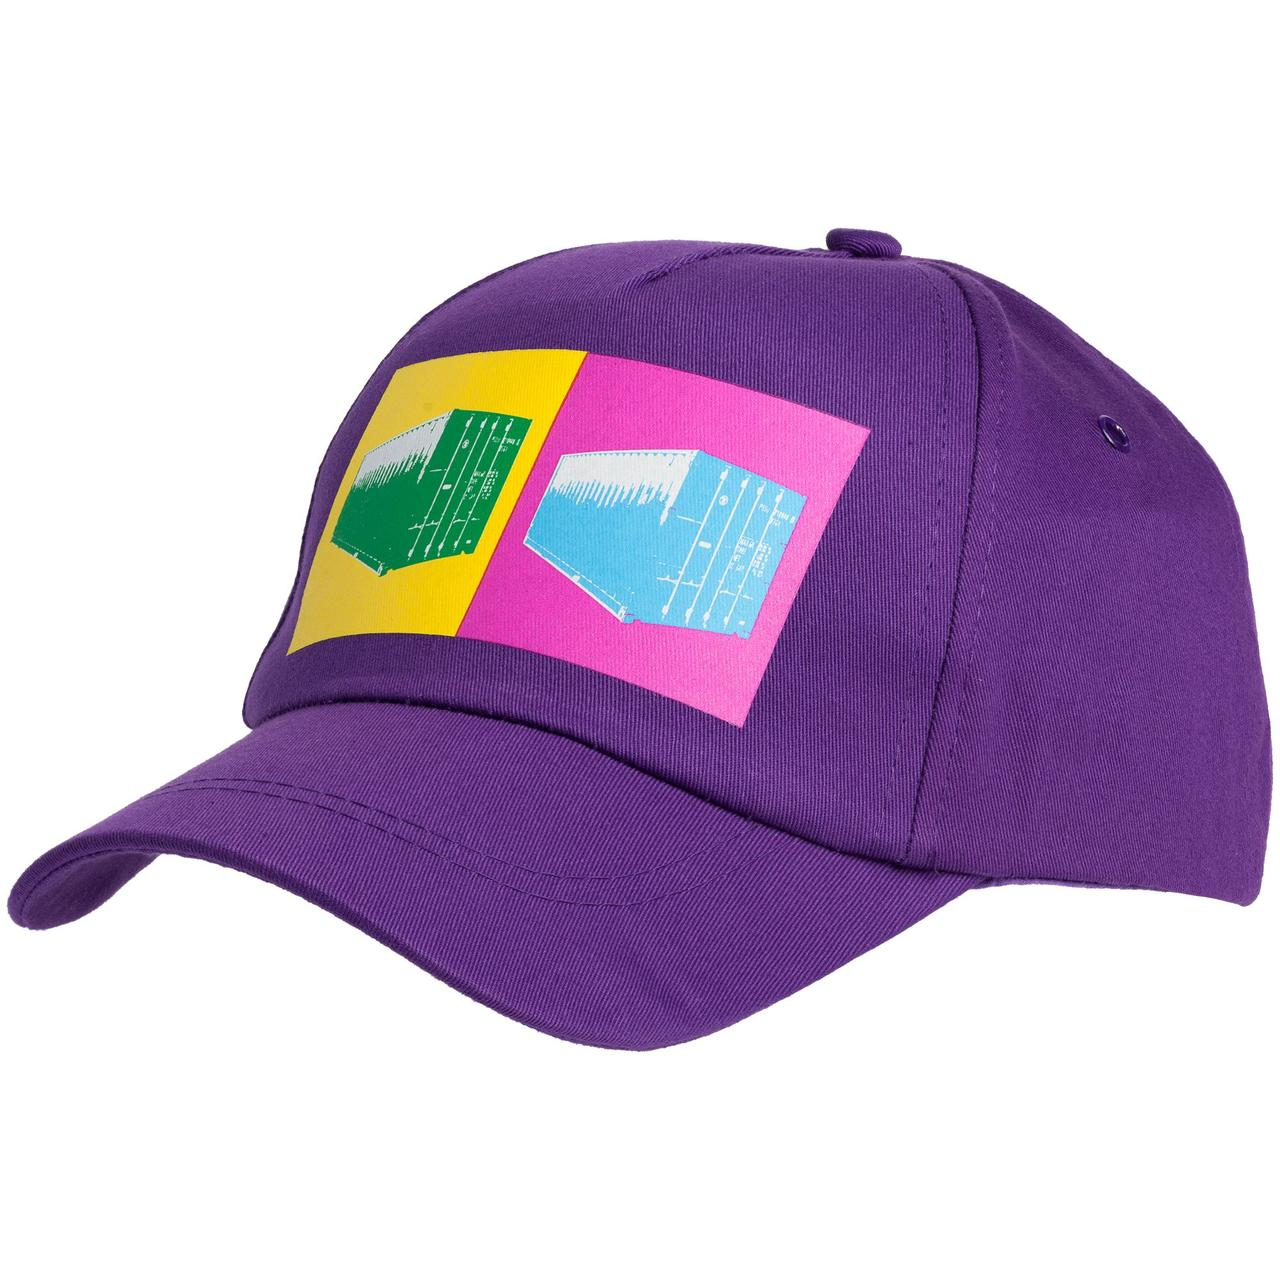 Бейсболка LogicArt, фиолетовая (артикул 70260.78)